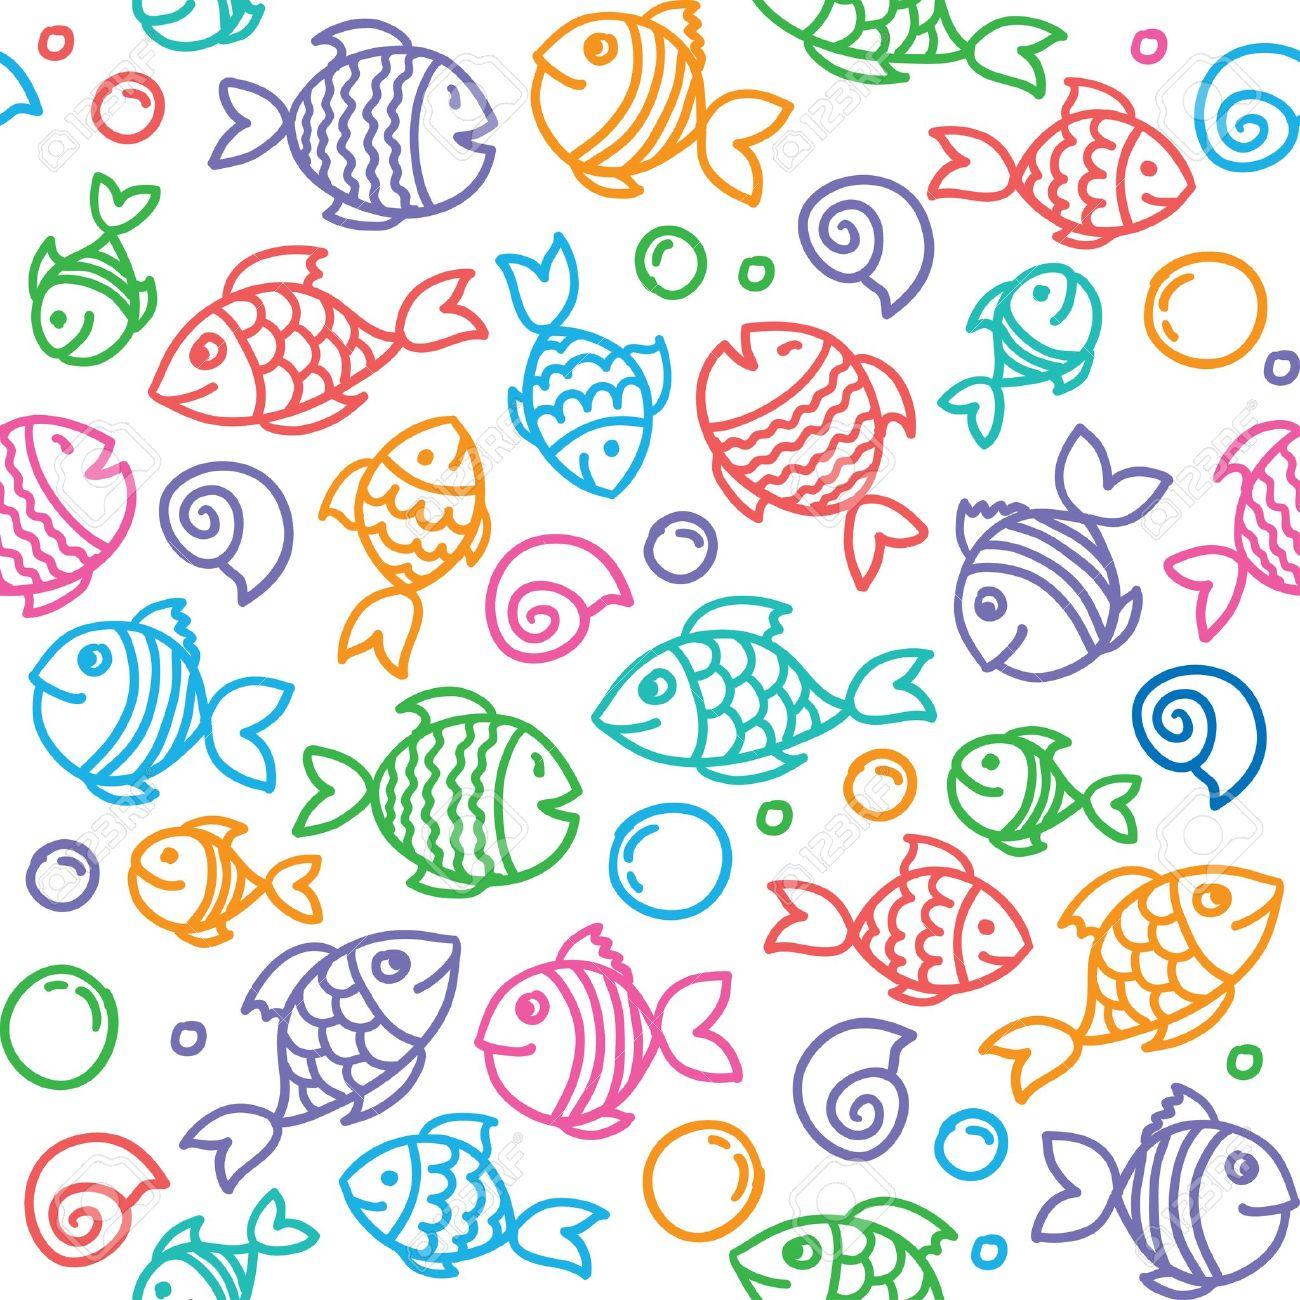 30 536 aquarium fish stock vector illustration and royalty free